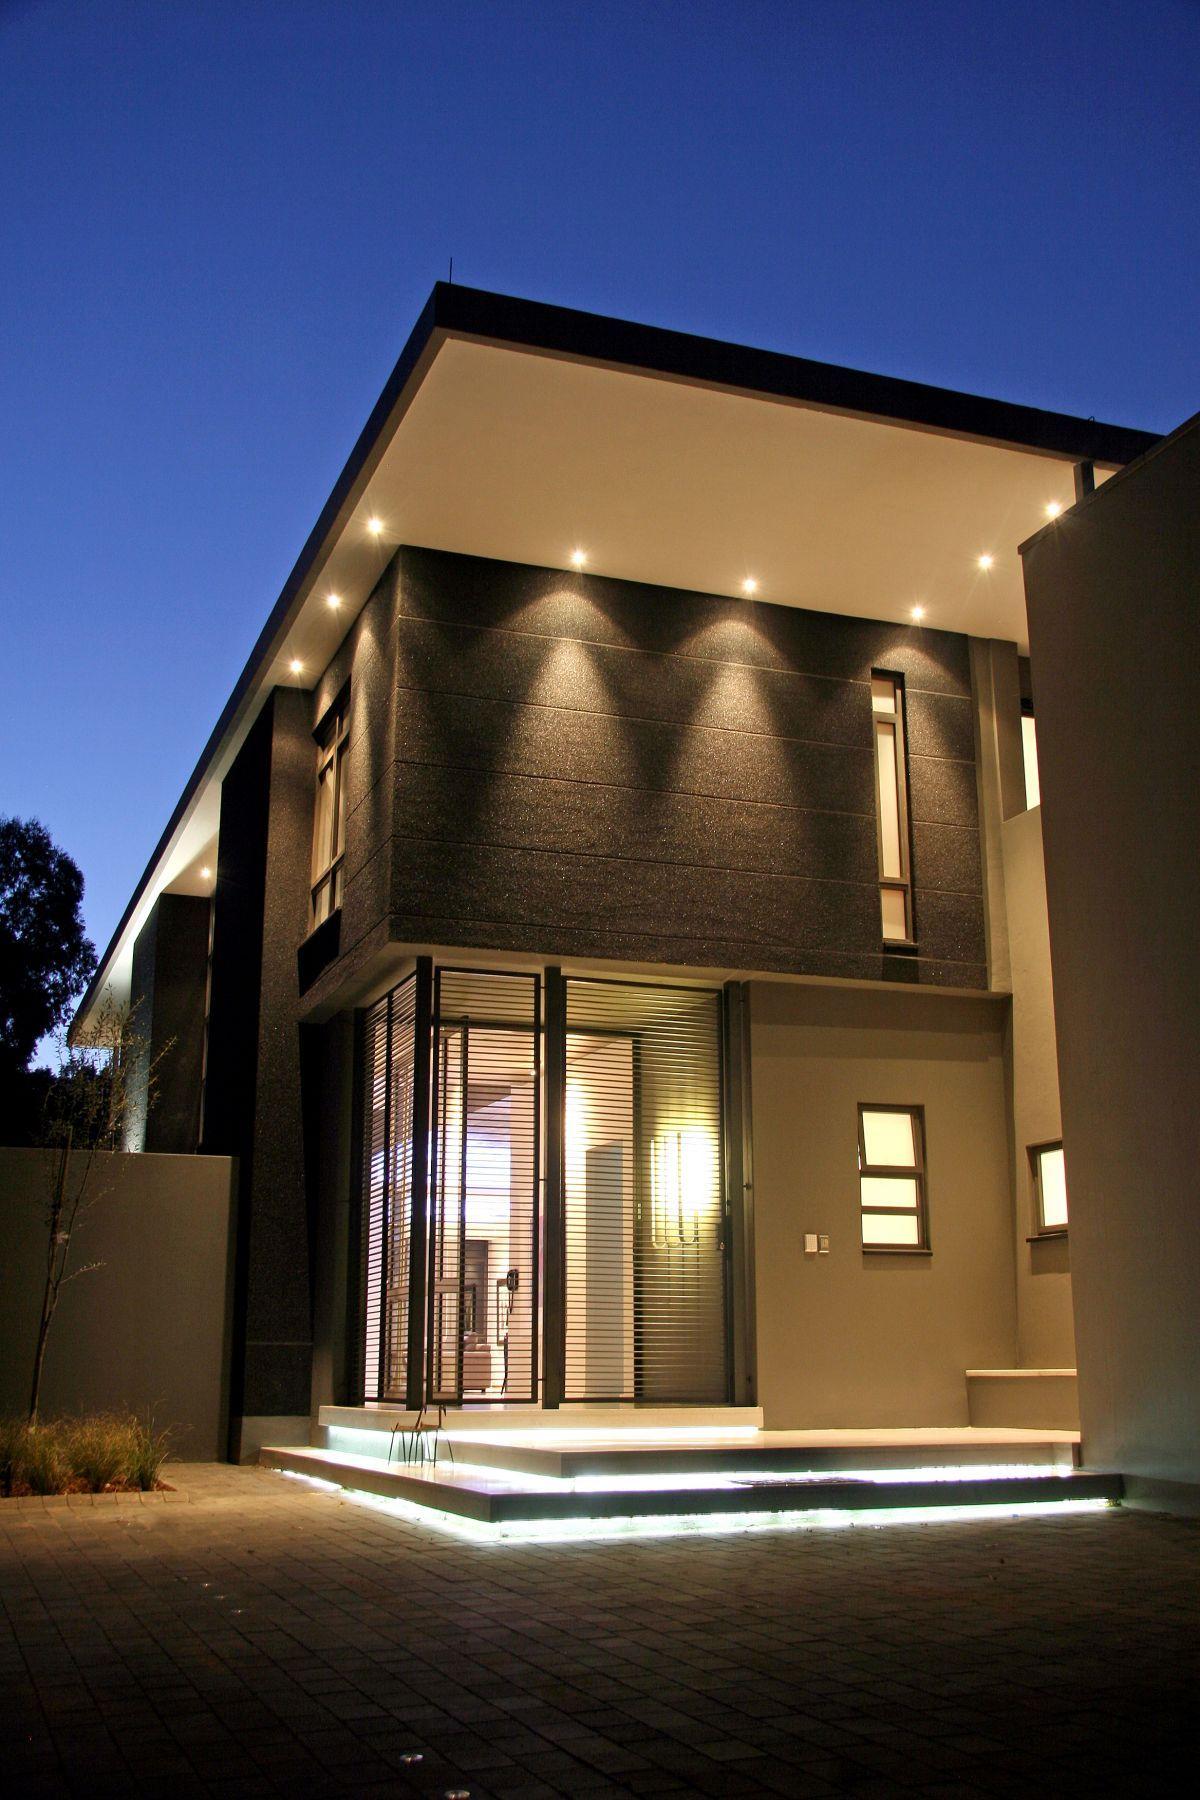 2 Storey Small House Interior Design Philippines Nel 2020 Case